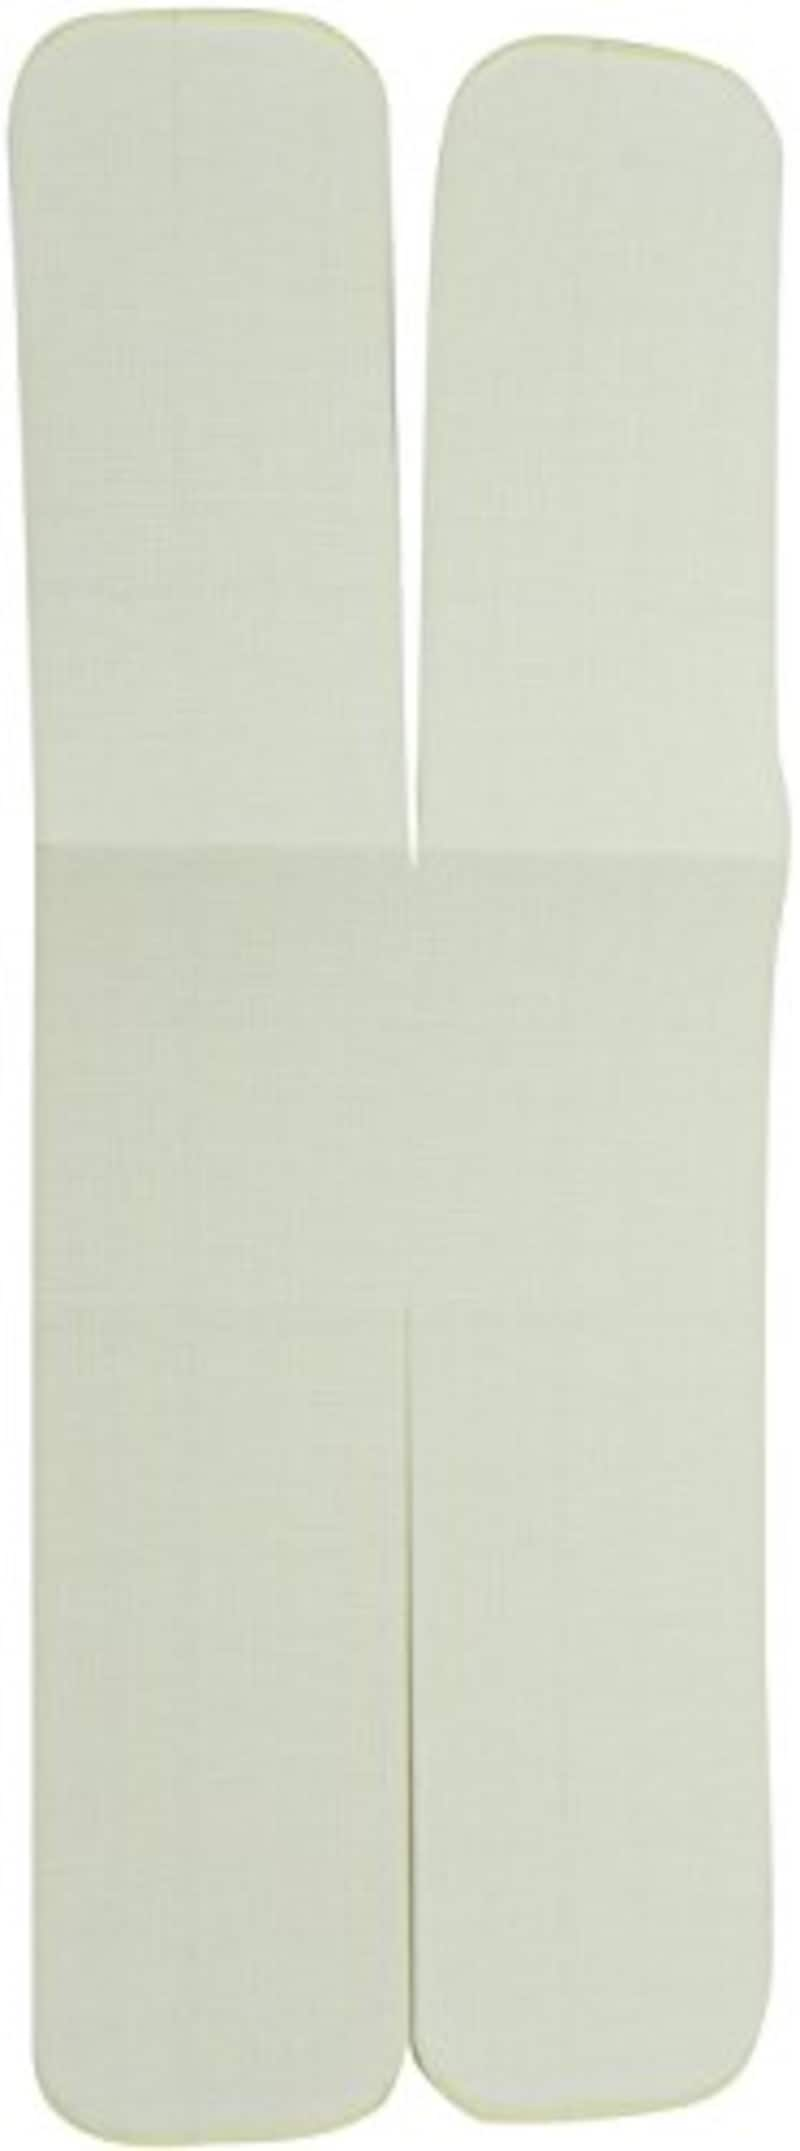 New-HALE(ニューハレ) ,テーピング テープ 足首用 プレカットタイプ すぐ貼れるシリーズ X-TAPE